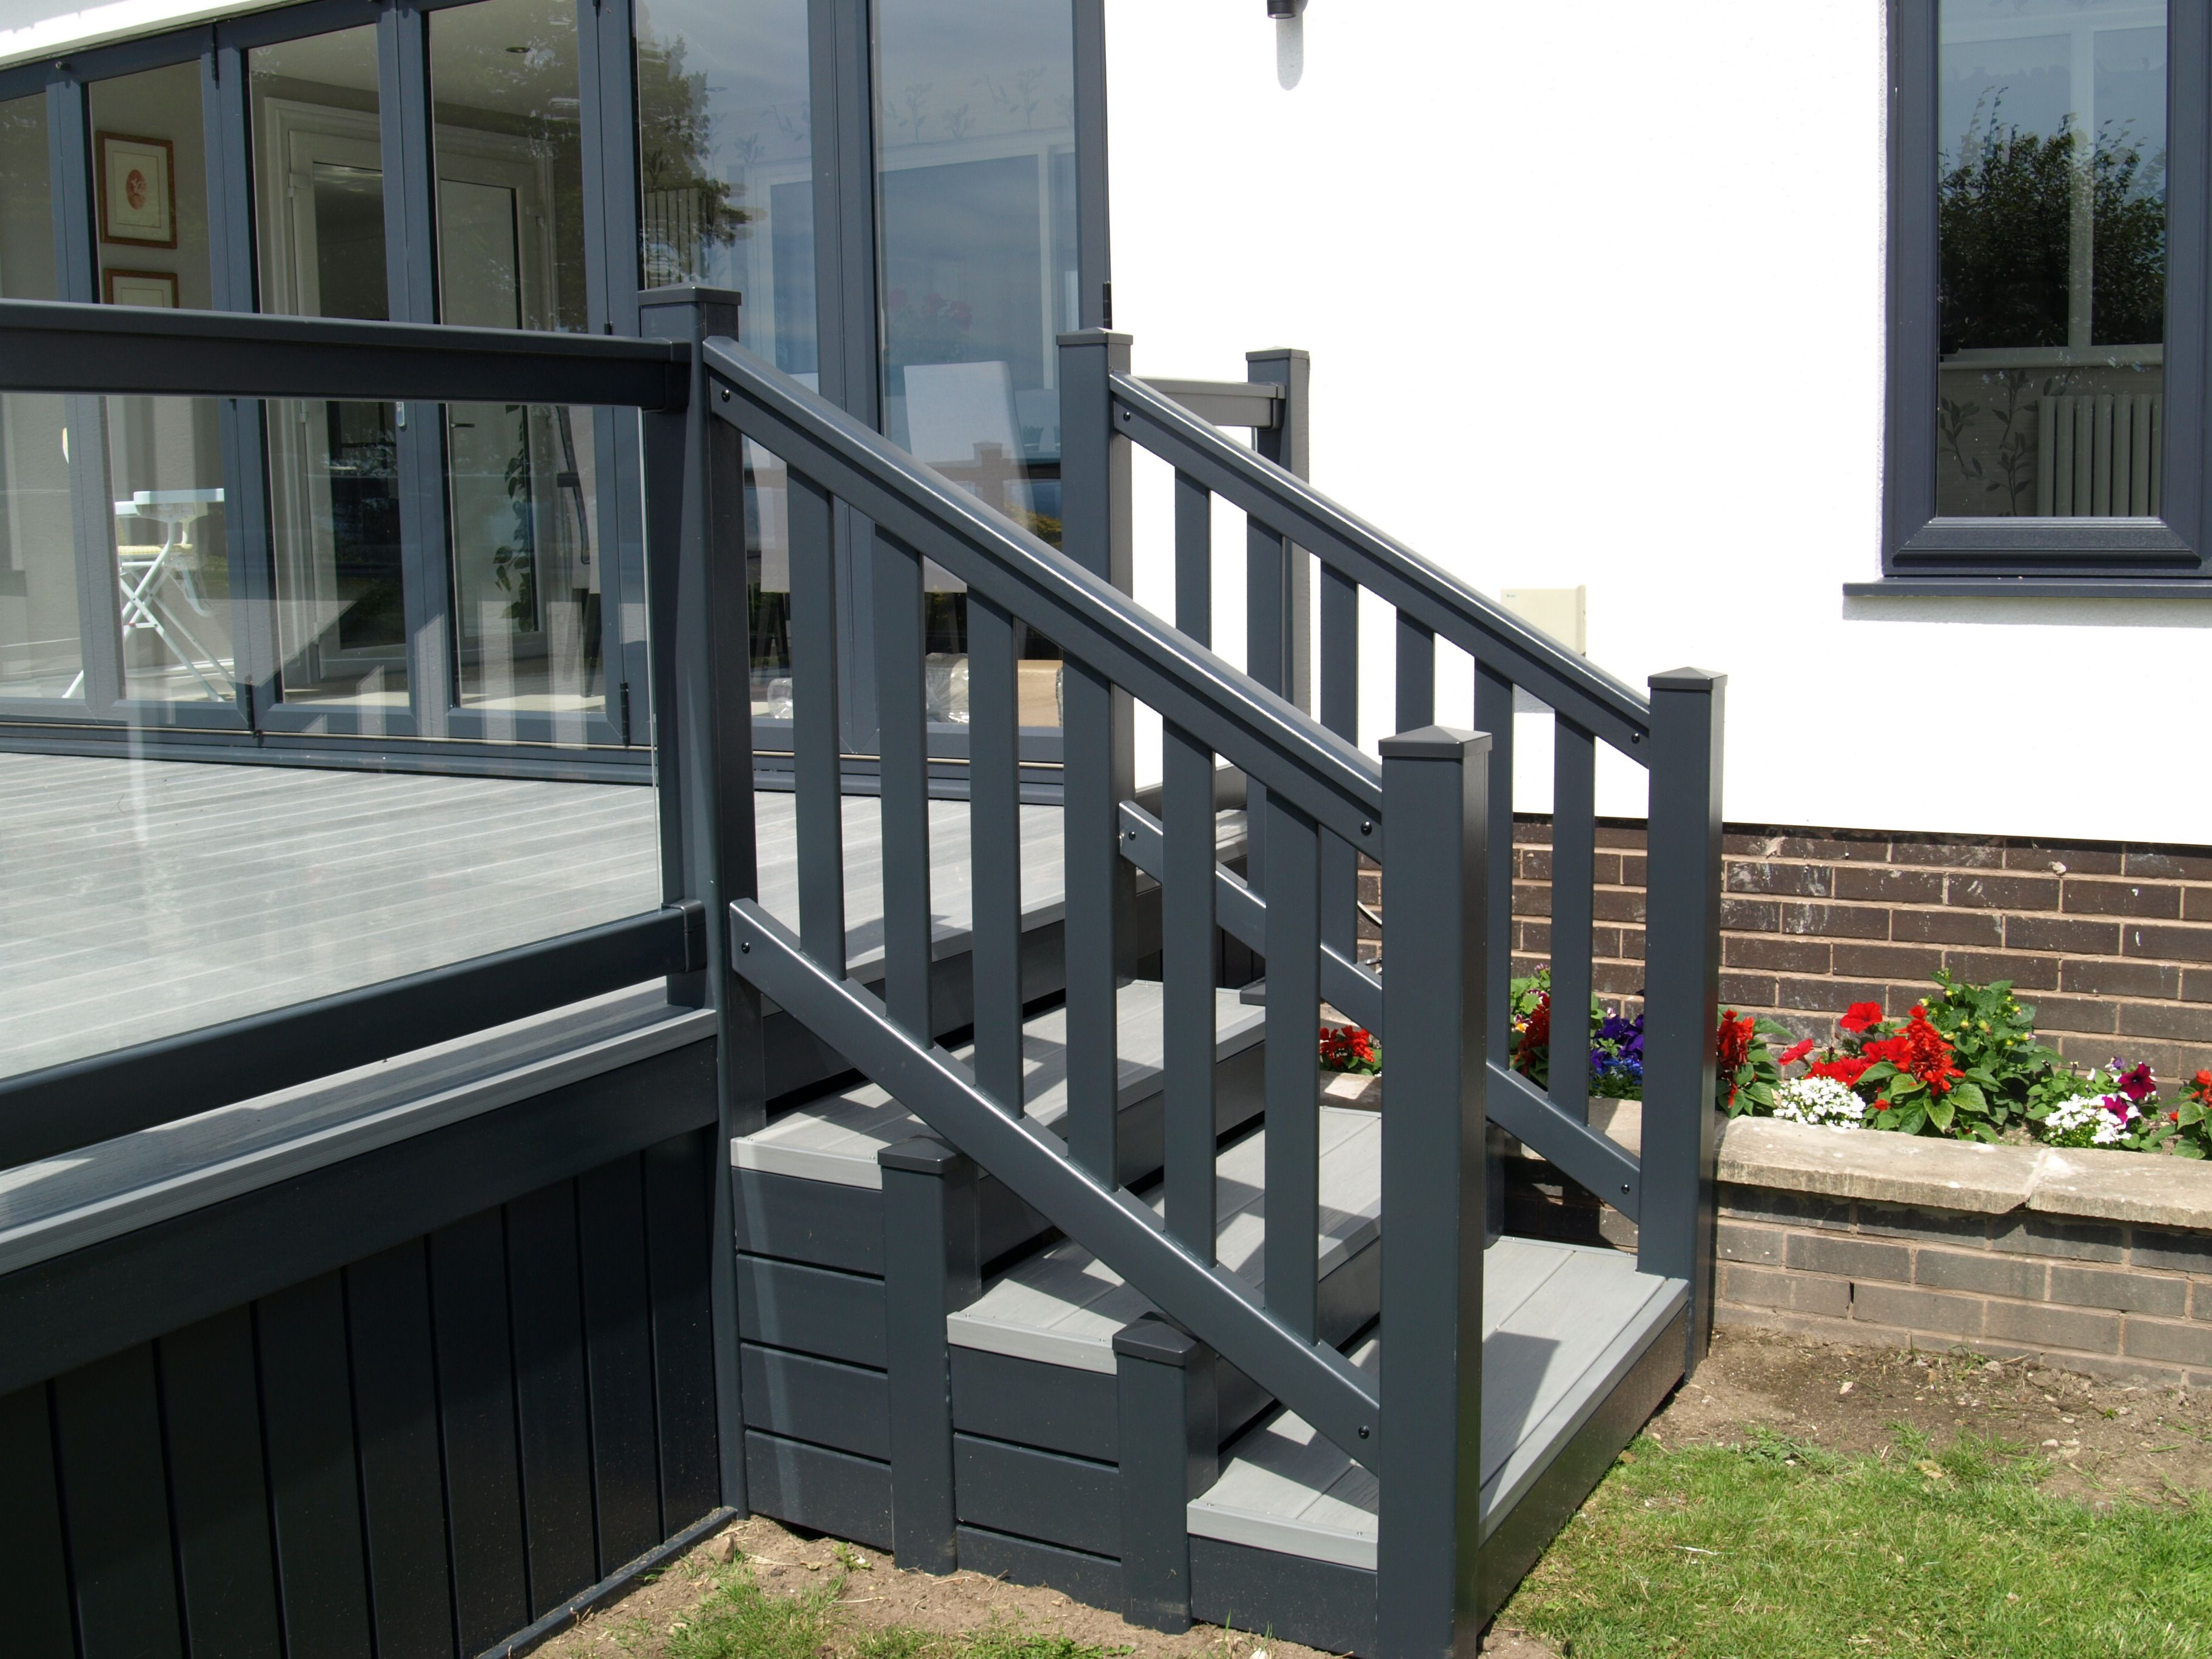 Best Diy Wood Plastic Hand Railing Outdoor In Uk Using Wood 400 x 300